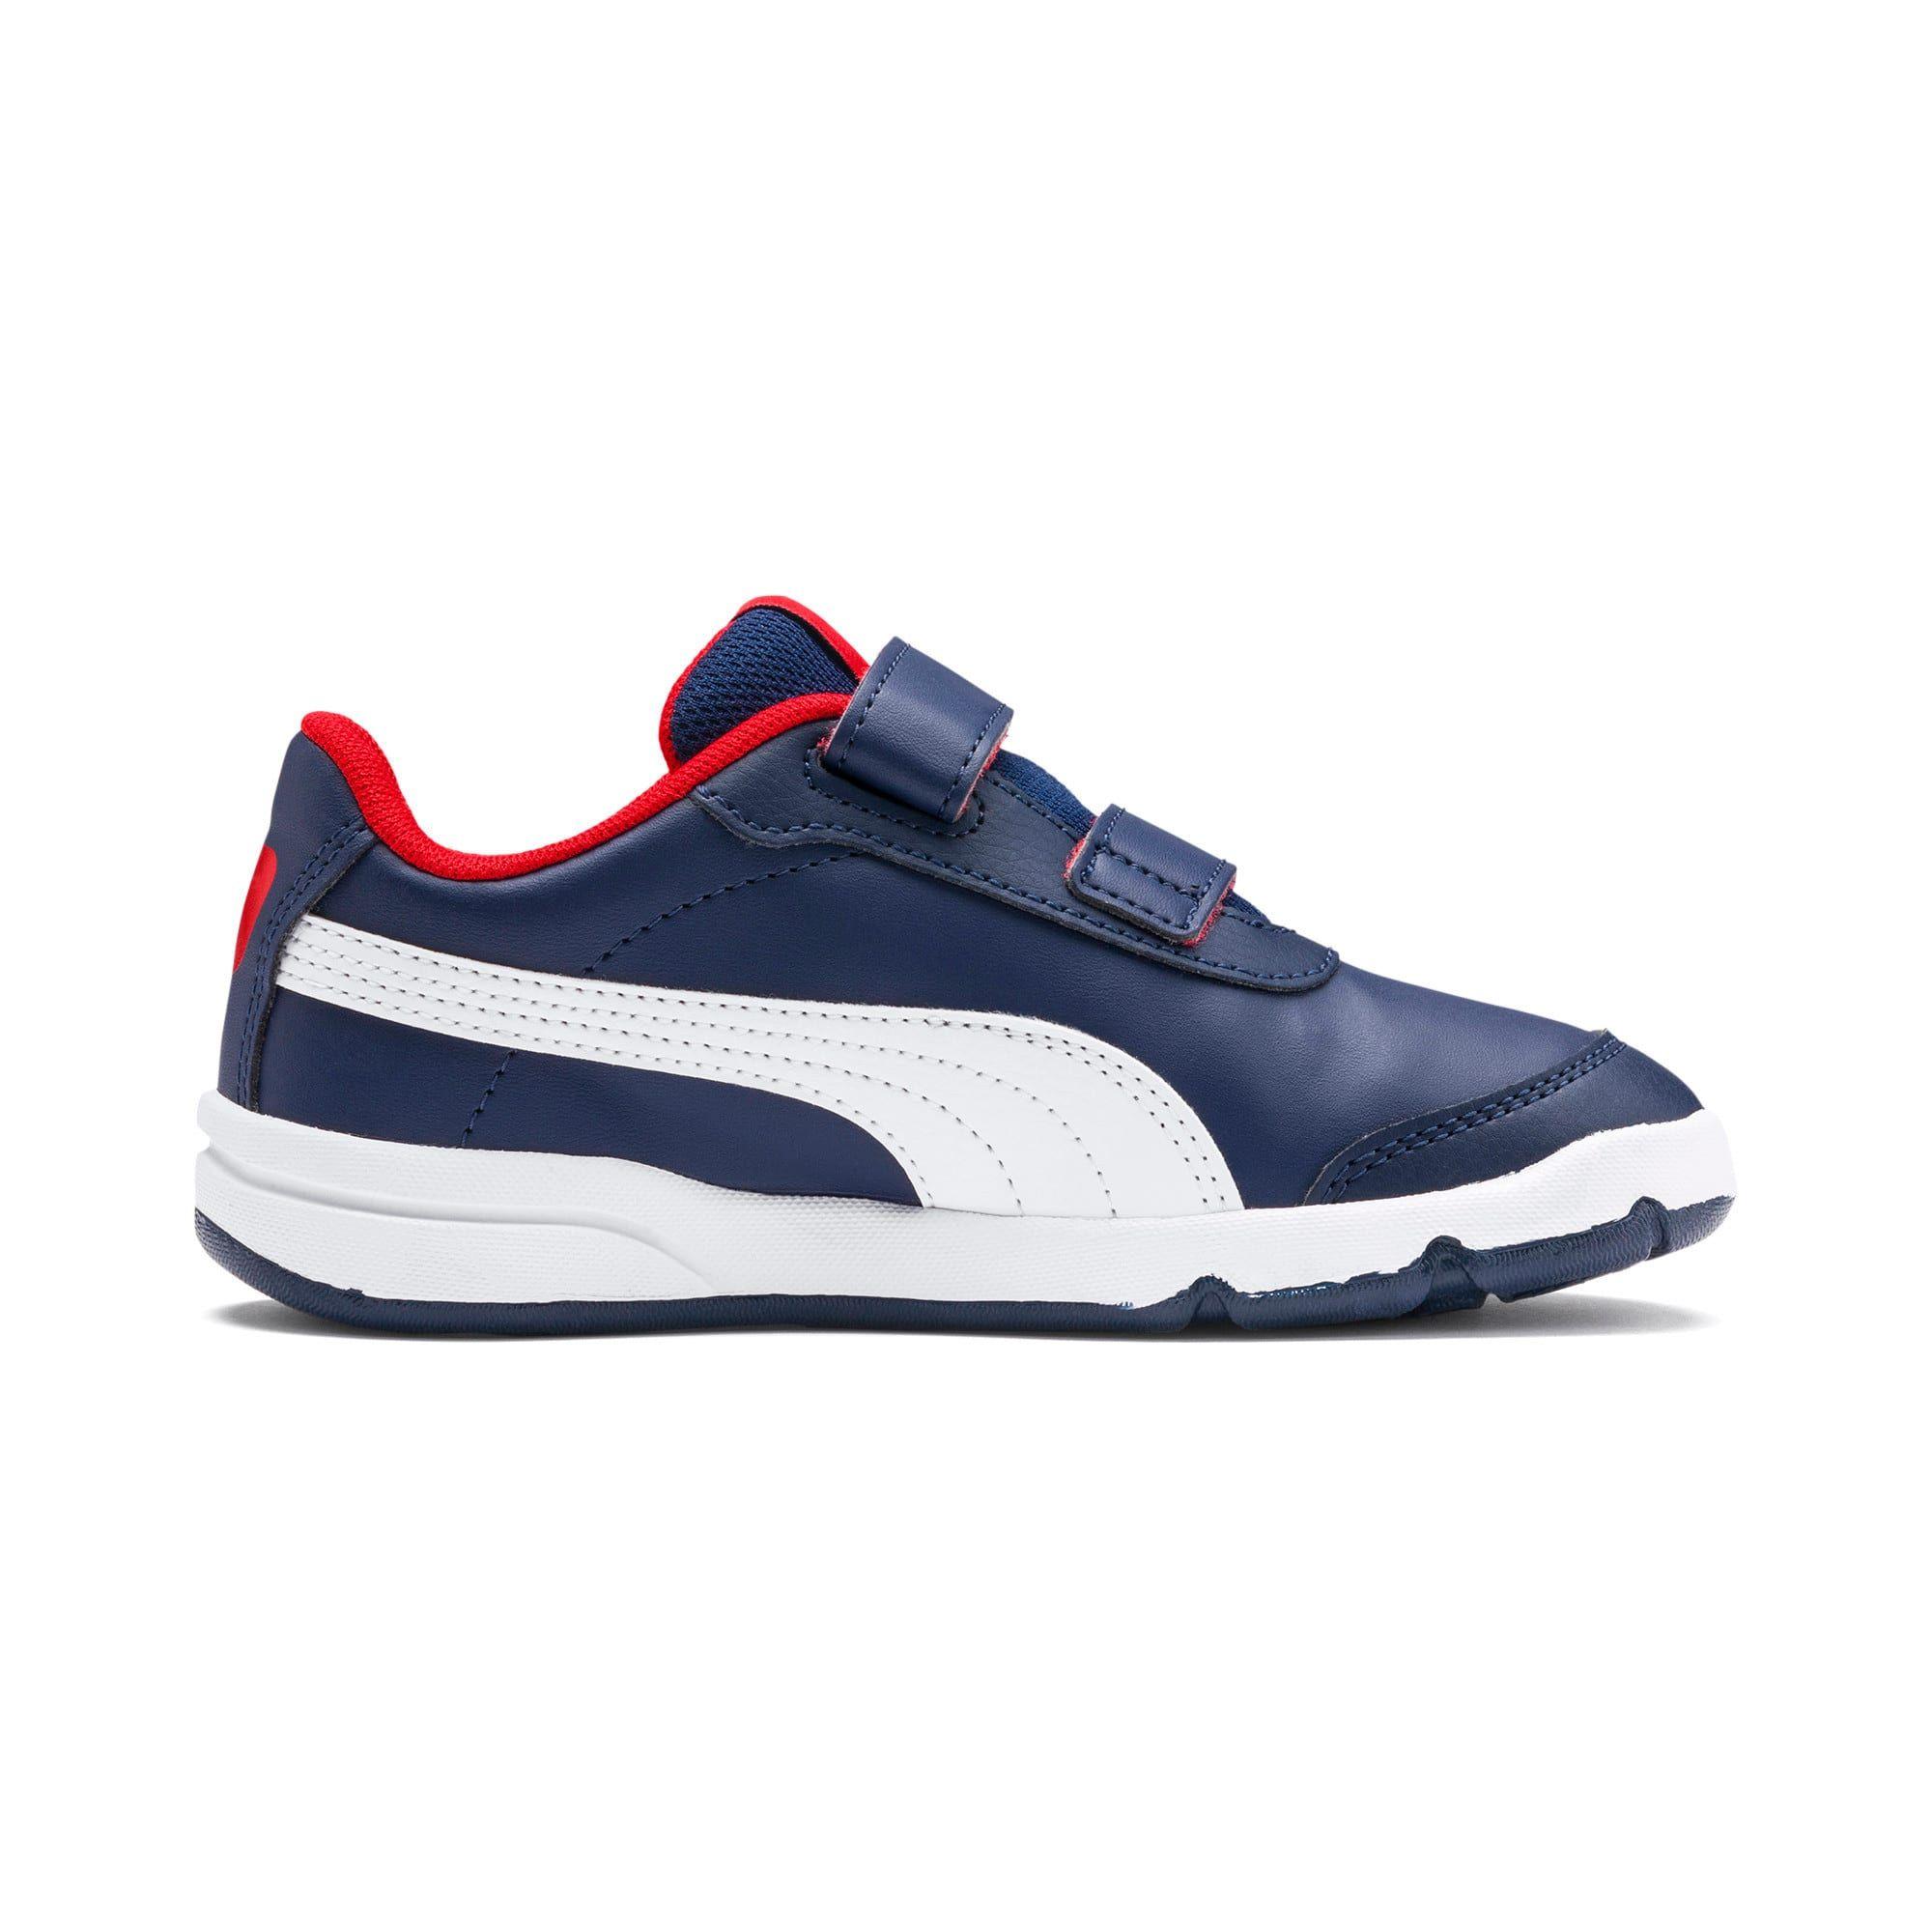 chaussure puma rouge et bleu